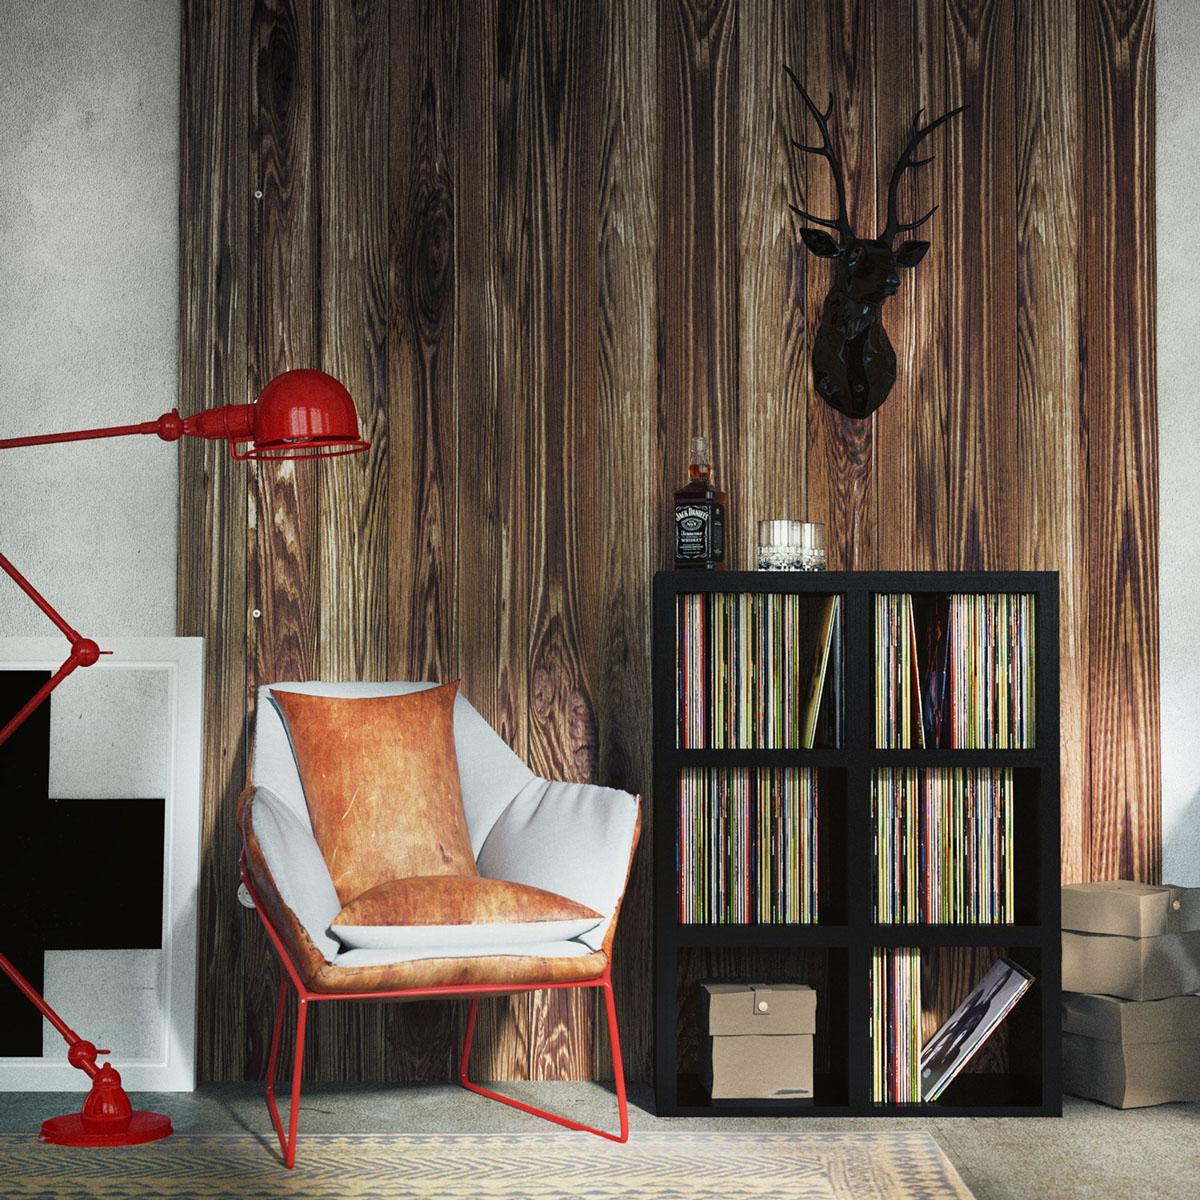 69 Cool Interiors With Exposed Brick Walls: Stylish Exposed Brick Wall Lofts